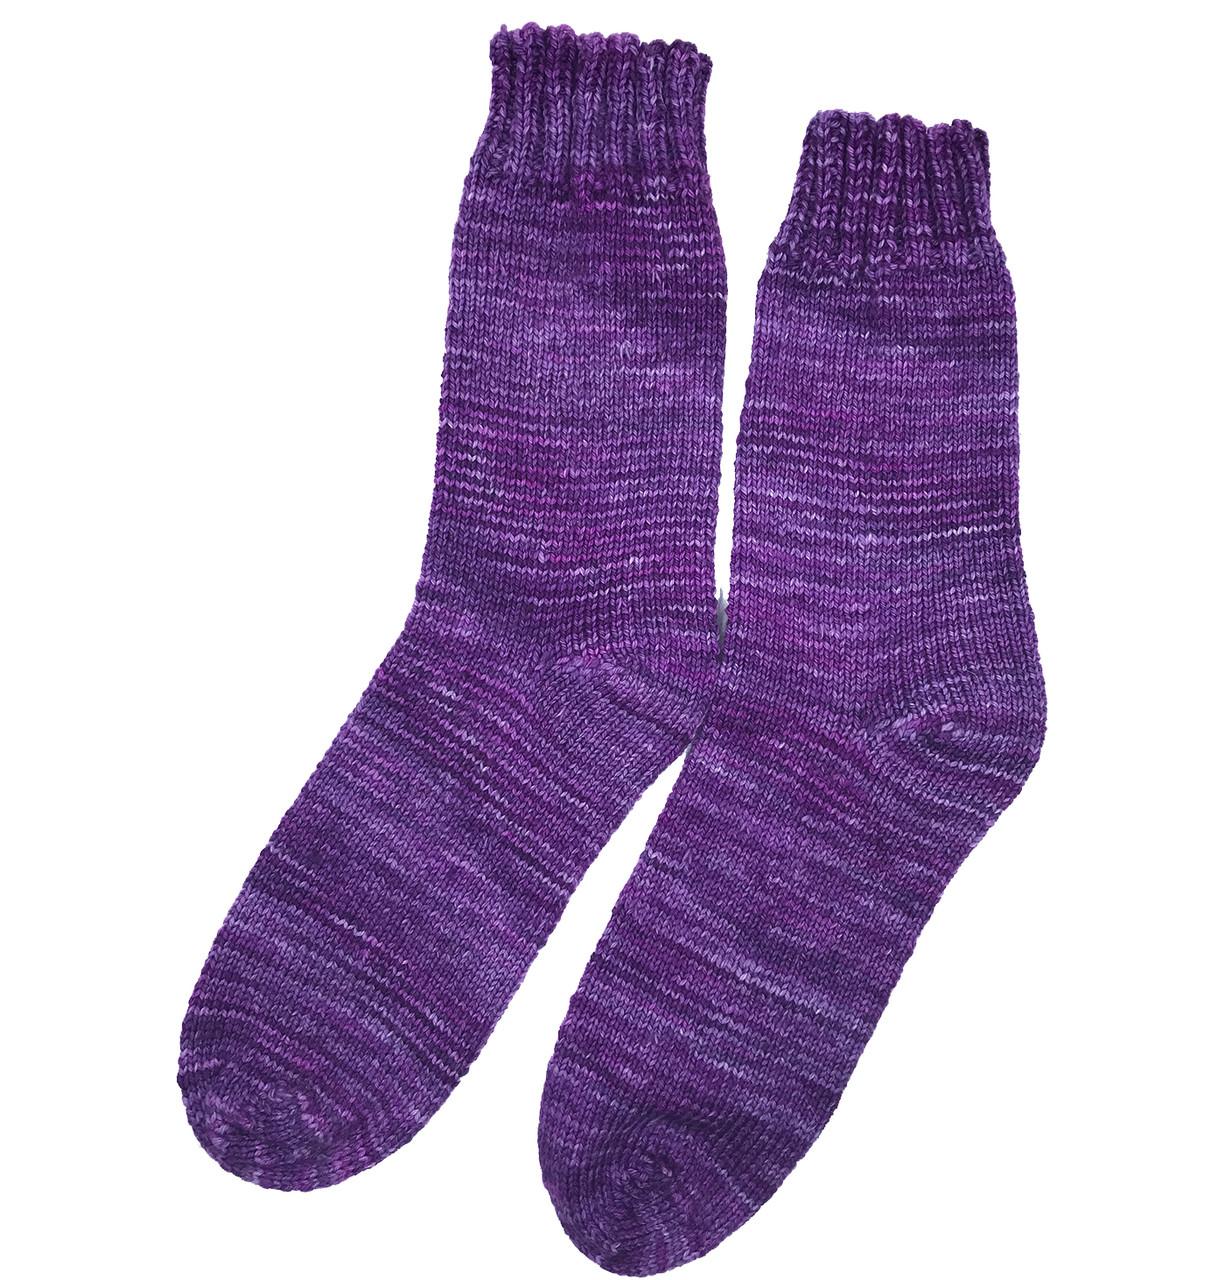 Authentic Knitting Board Sock Loom